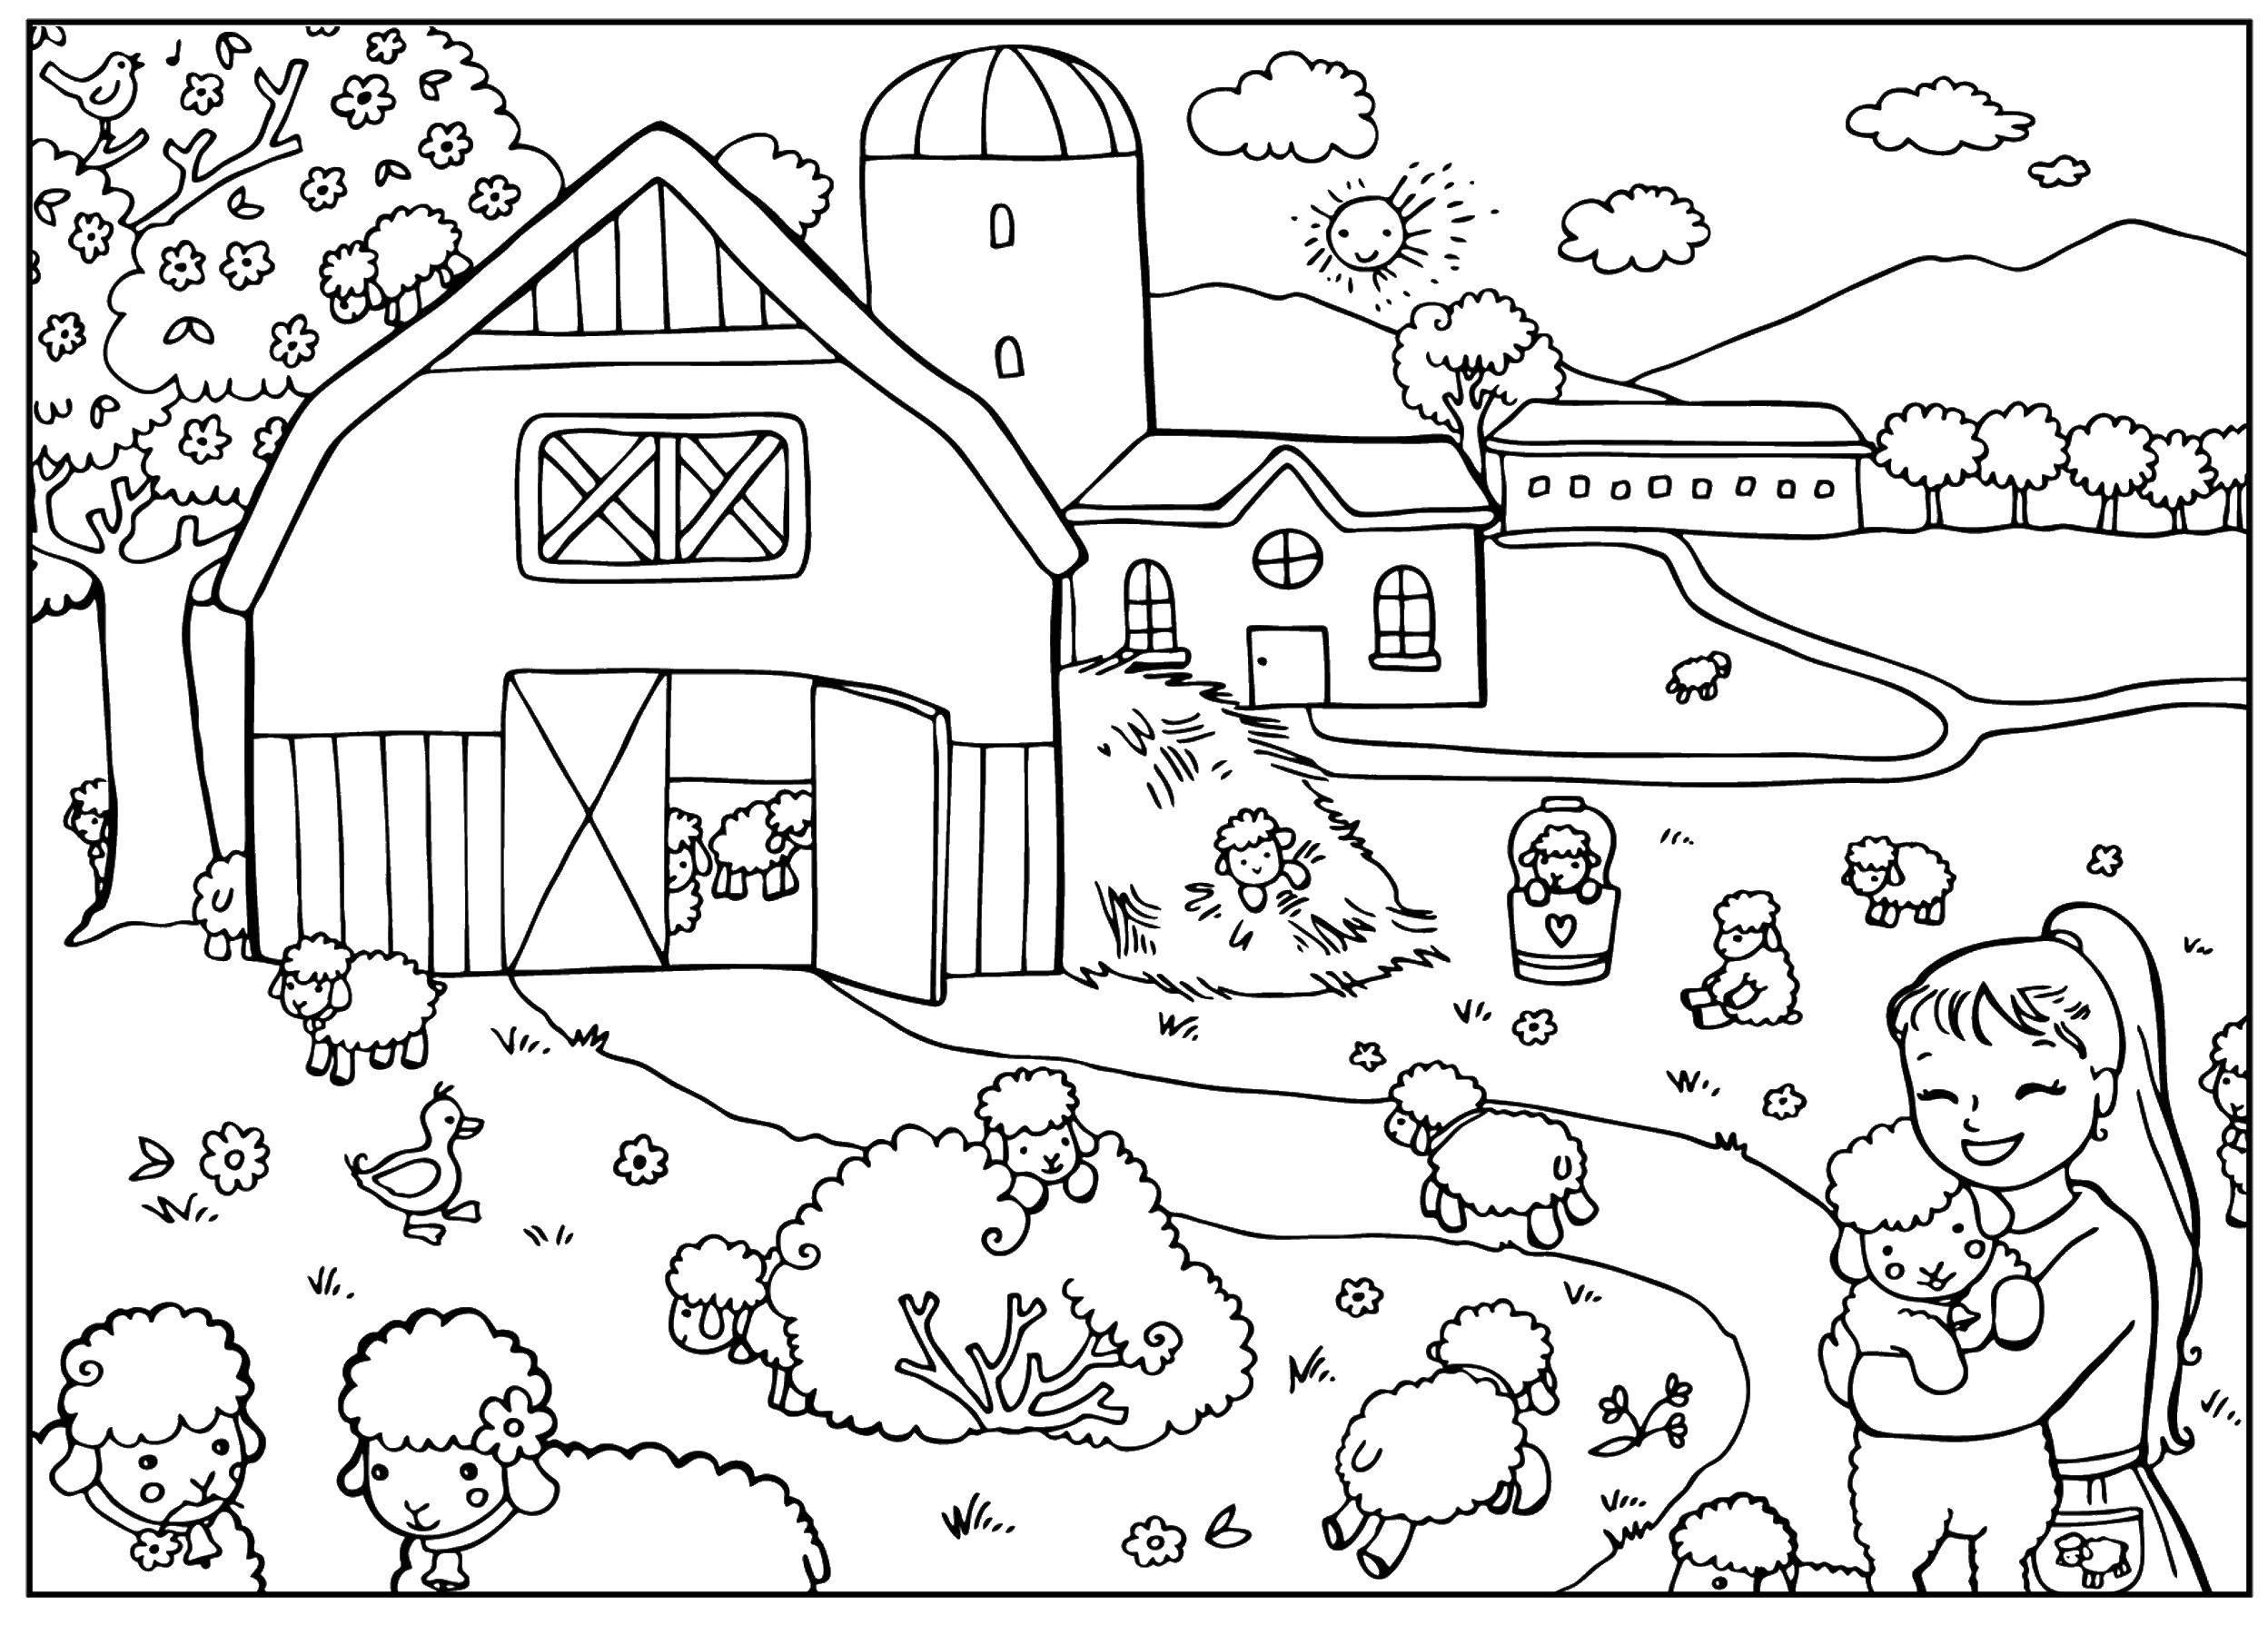 Coloring pages Village Скачать .  Распечатать